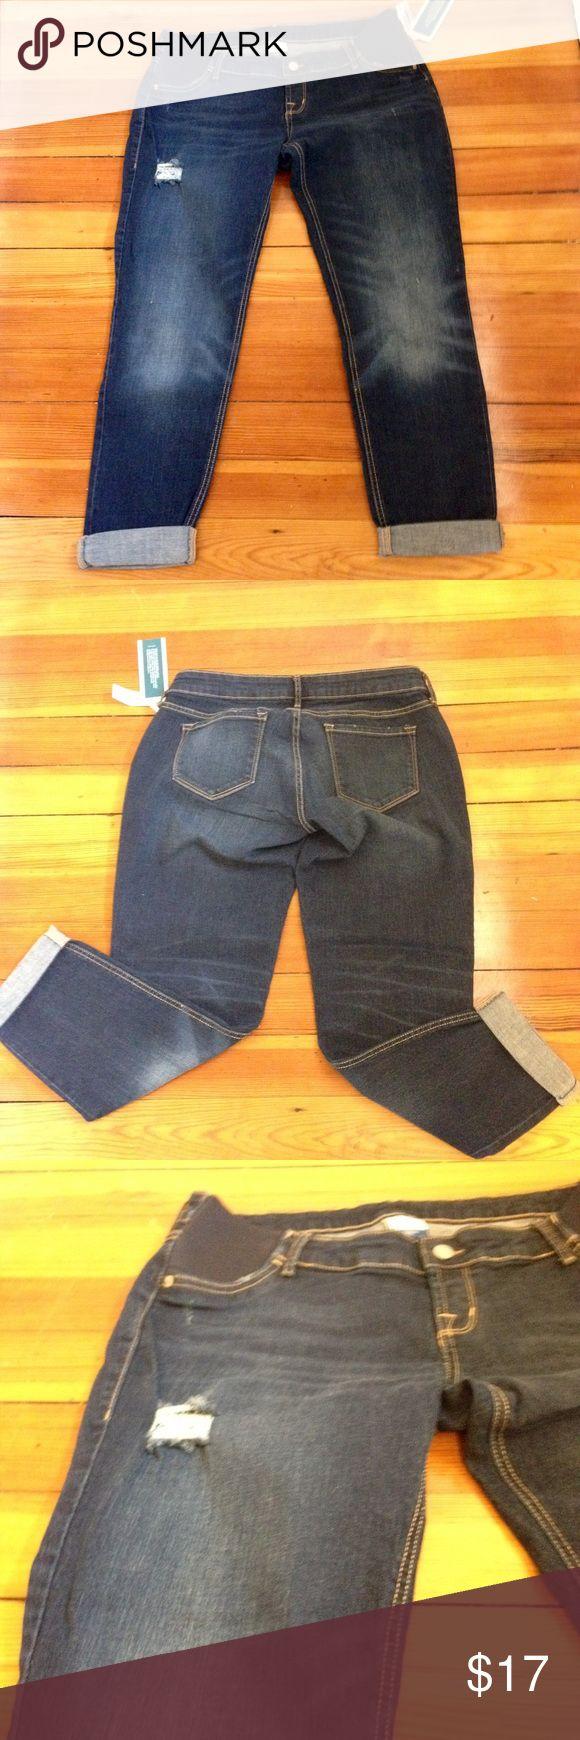 NWT Old Navy Maternity Jeans Boyfriend  Distressed NWT Old Navy Maternity Jeans Boyfriend  Skinny Distressed Size 10 Old Navy Jeans Boyfriend